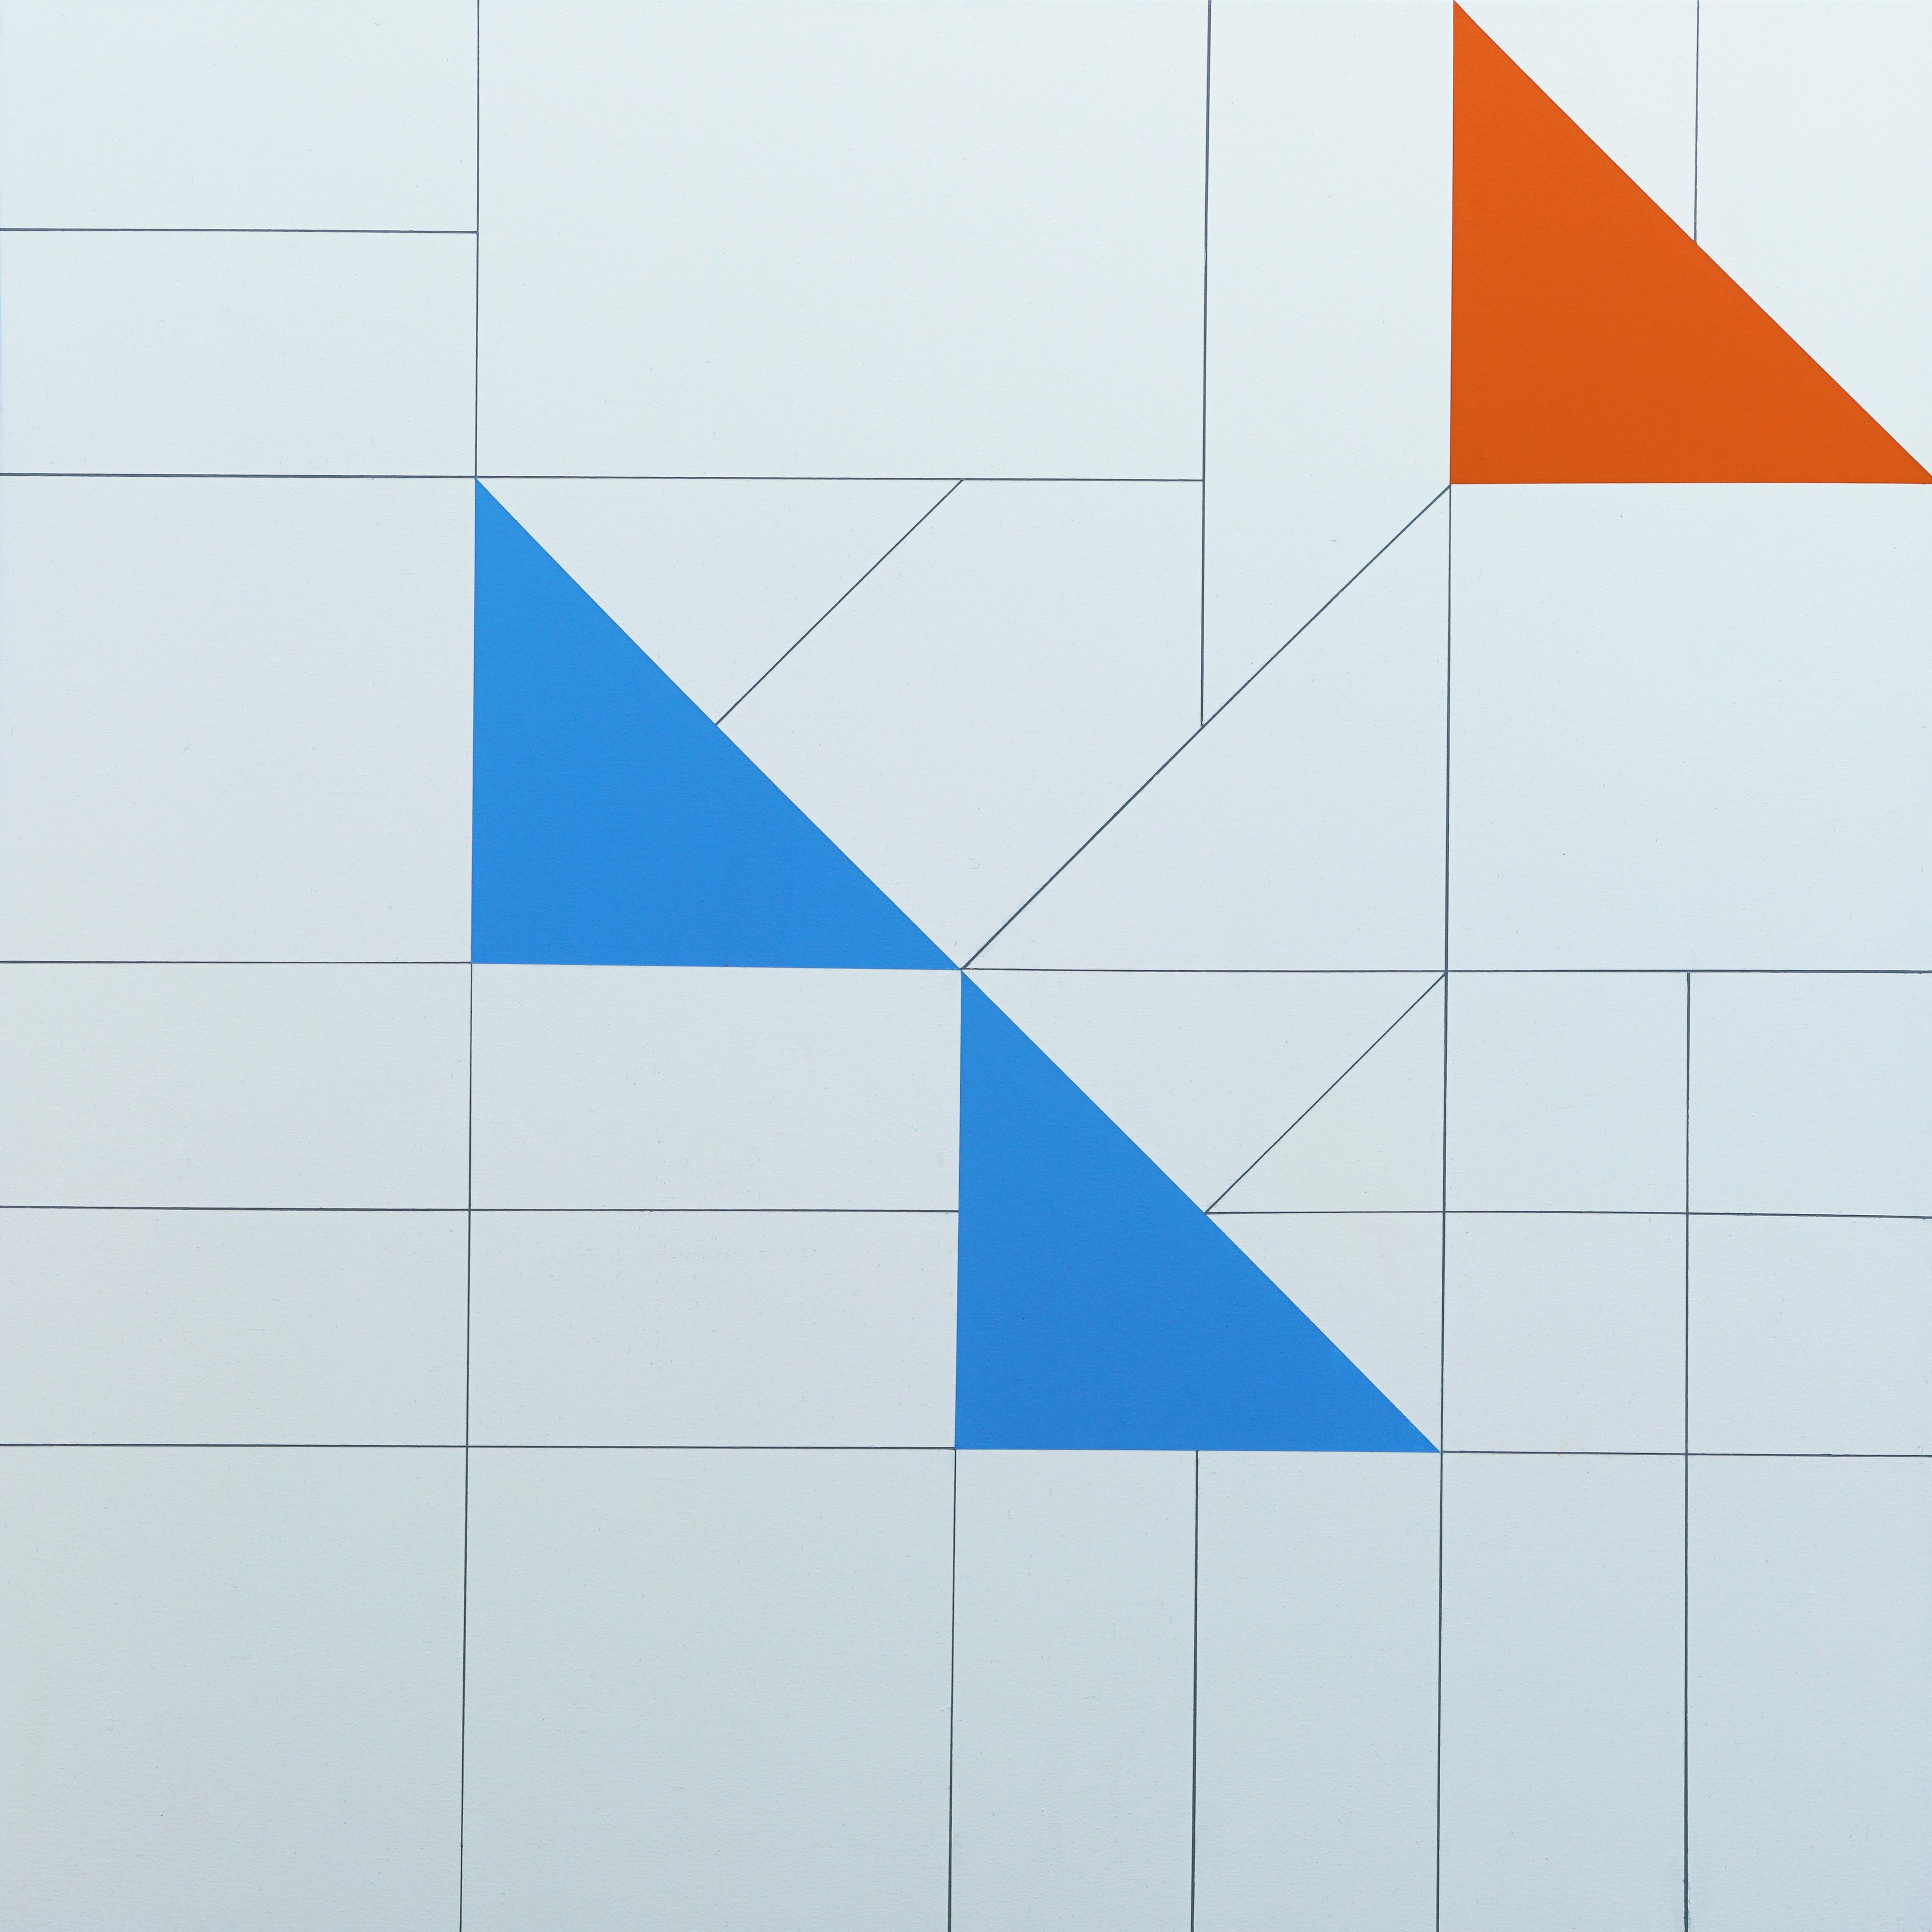 31 (3:21) A by Tim McKay | ArtworkNetwork.com